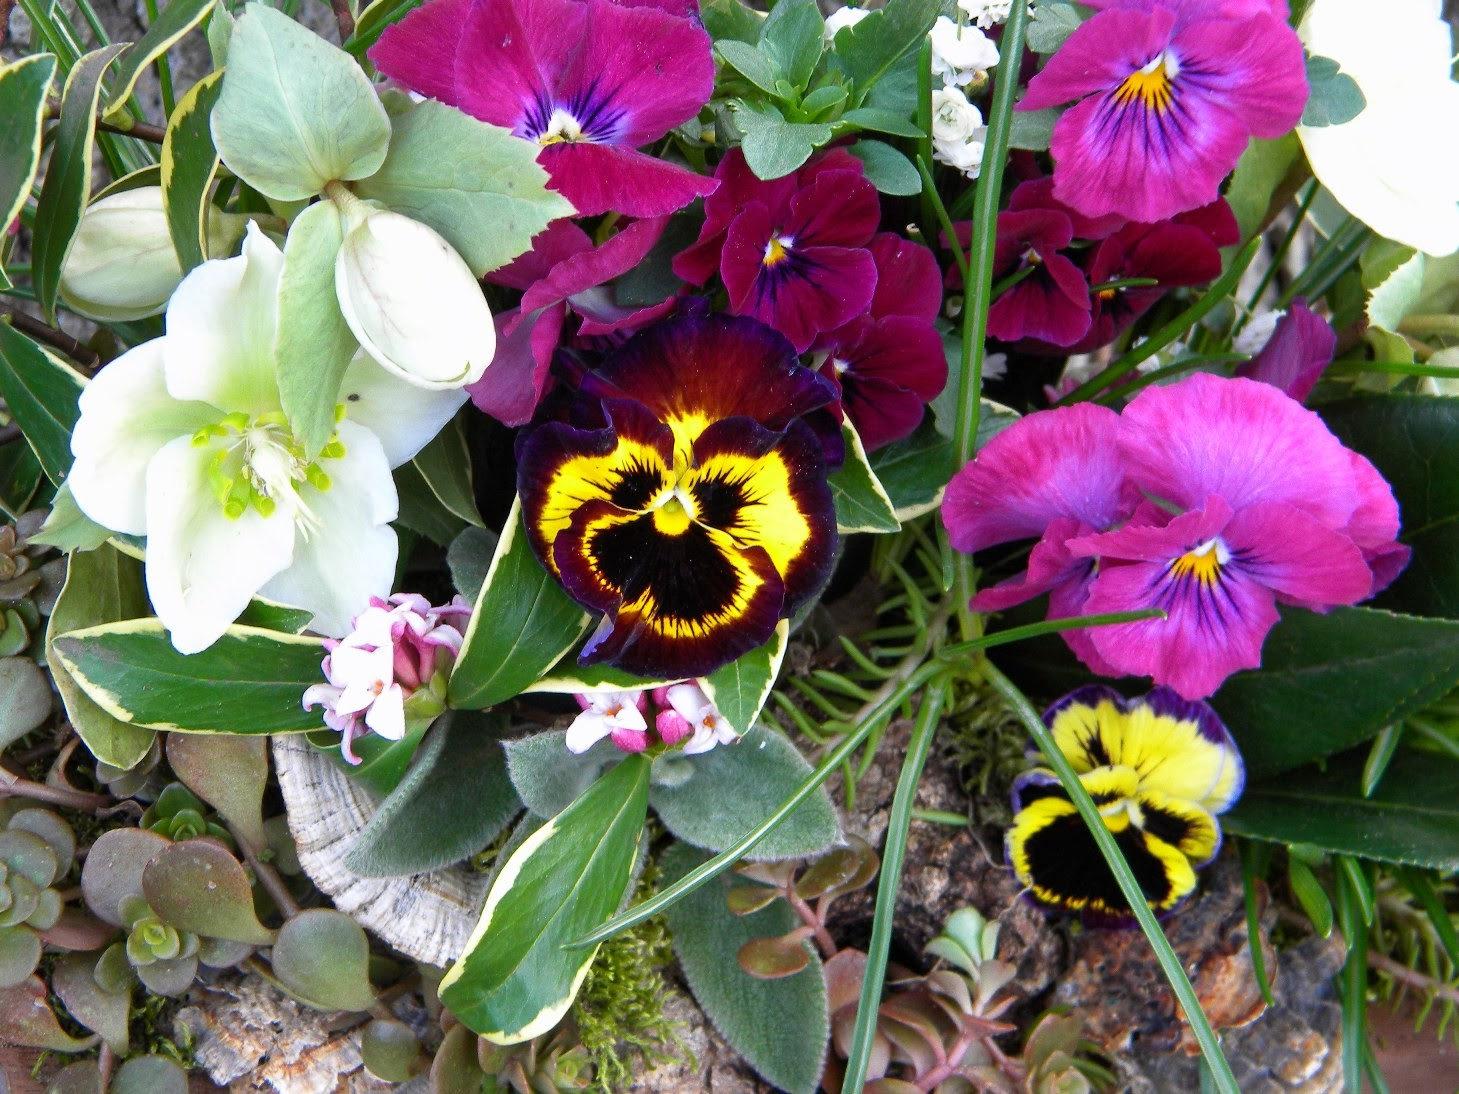 Set up your winter garden